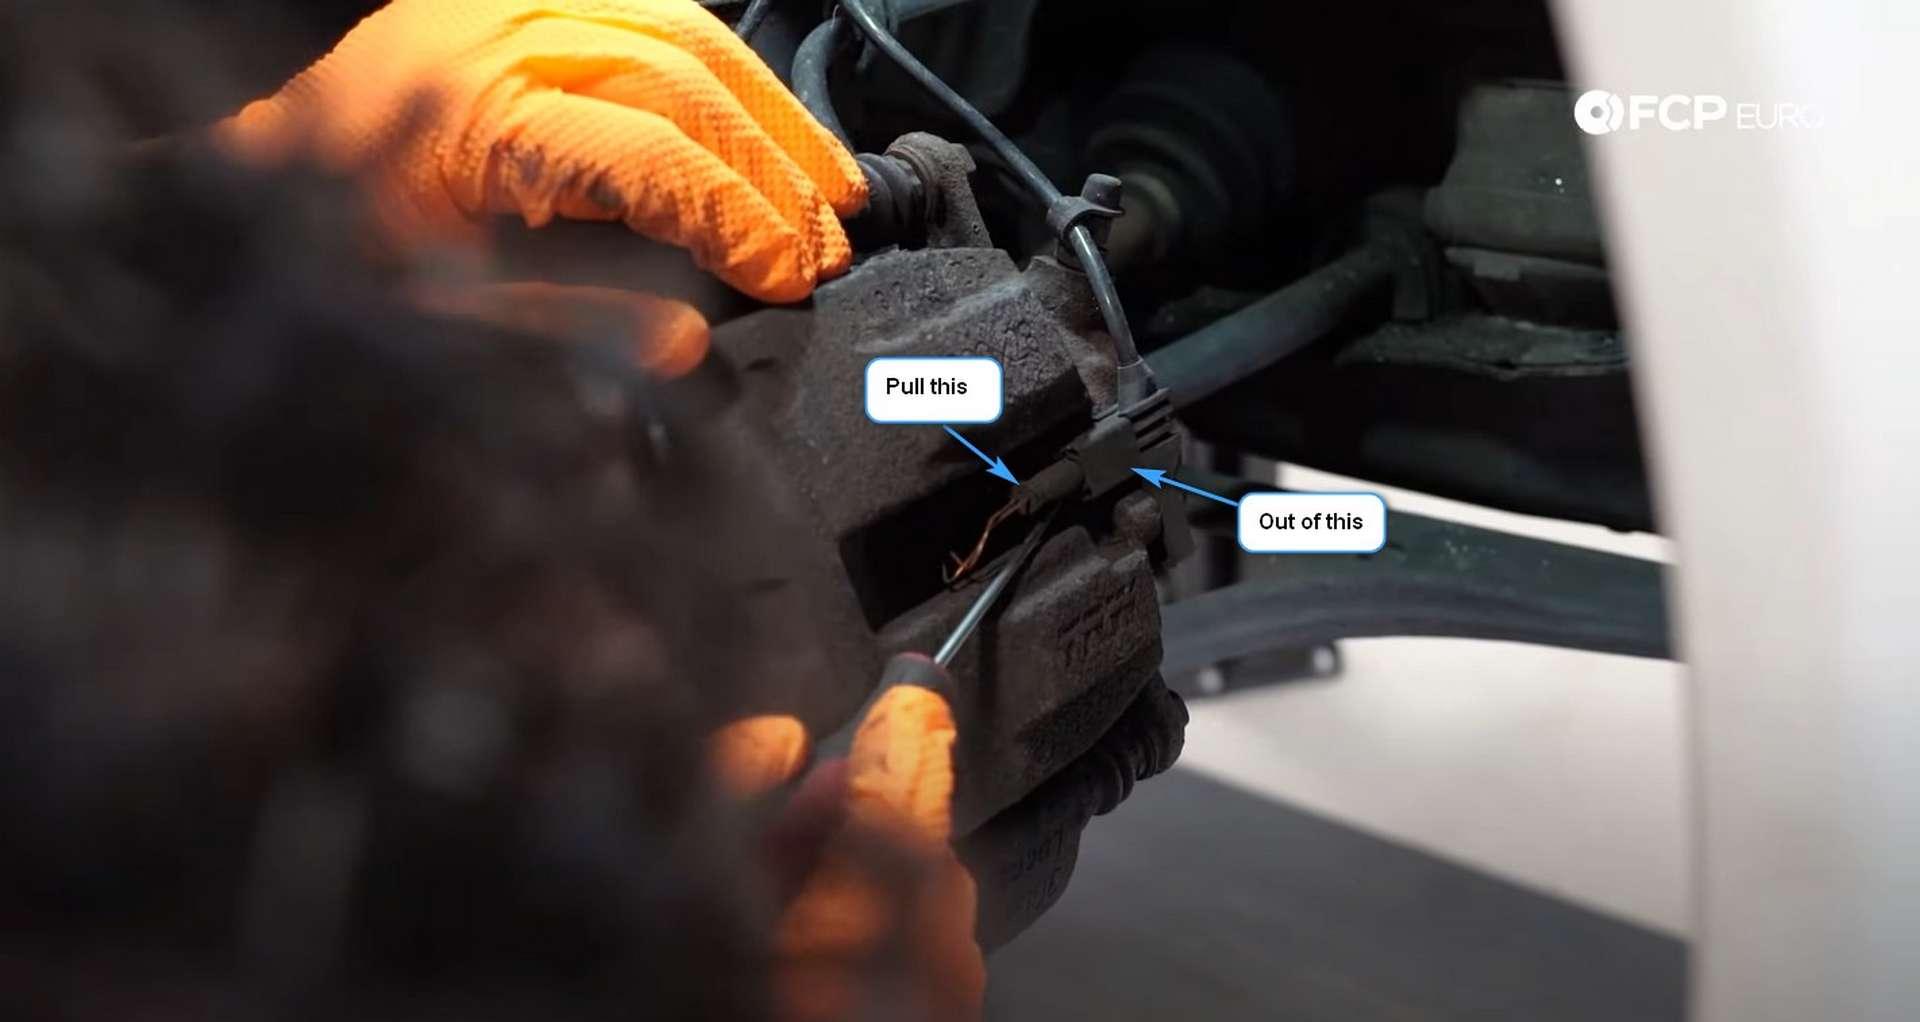 DIY Mercedes W203 Front Brake Service removing the pad wear sensor